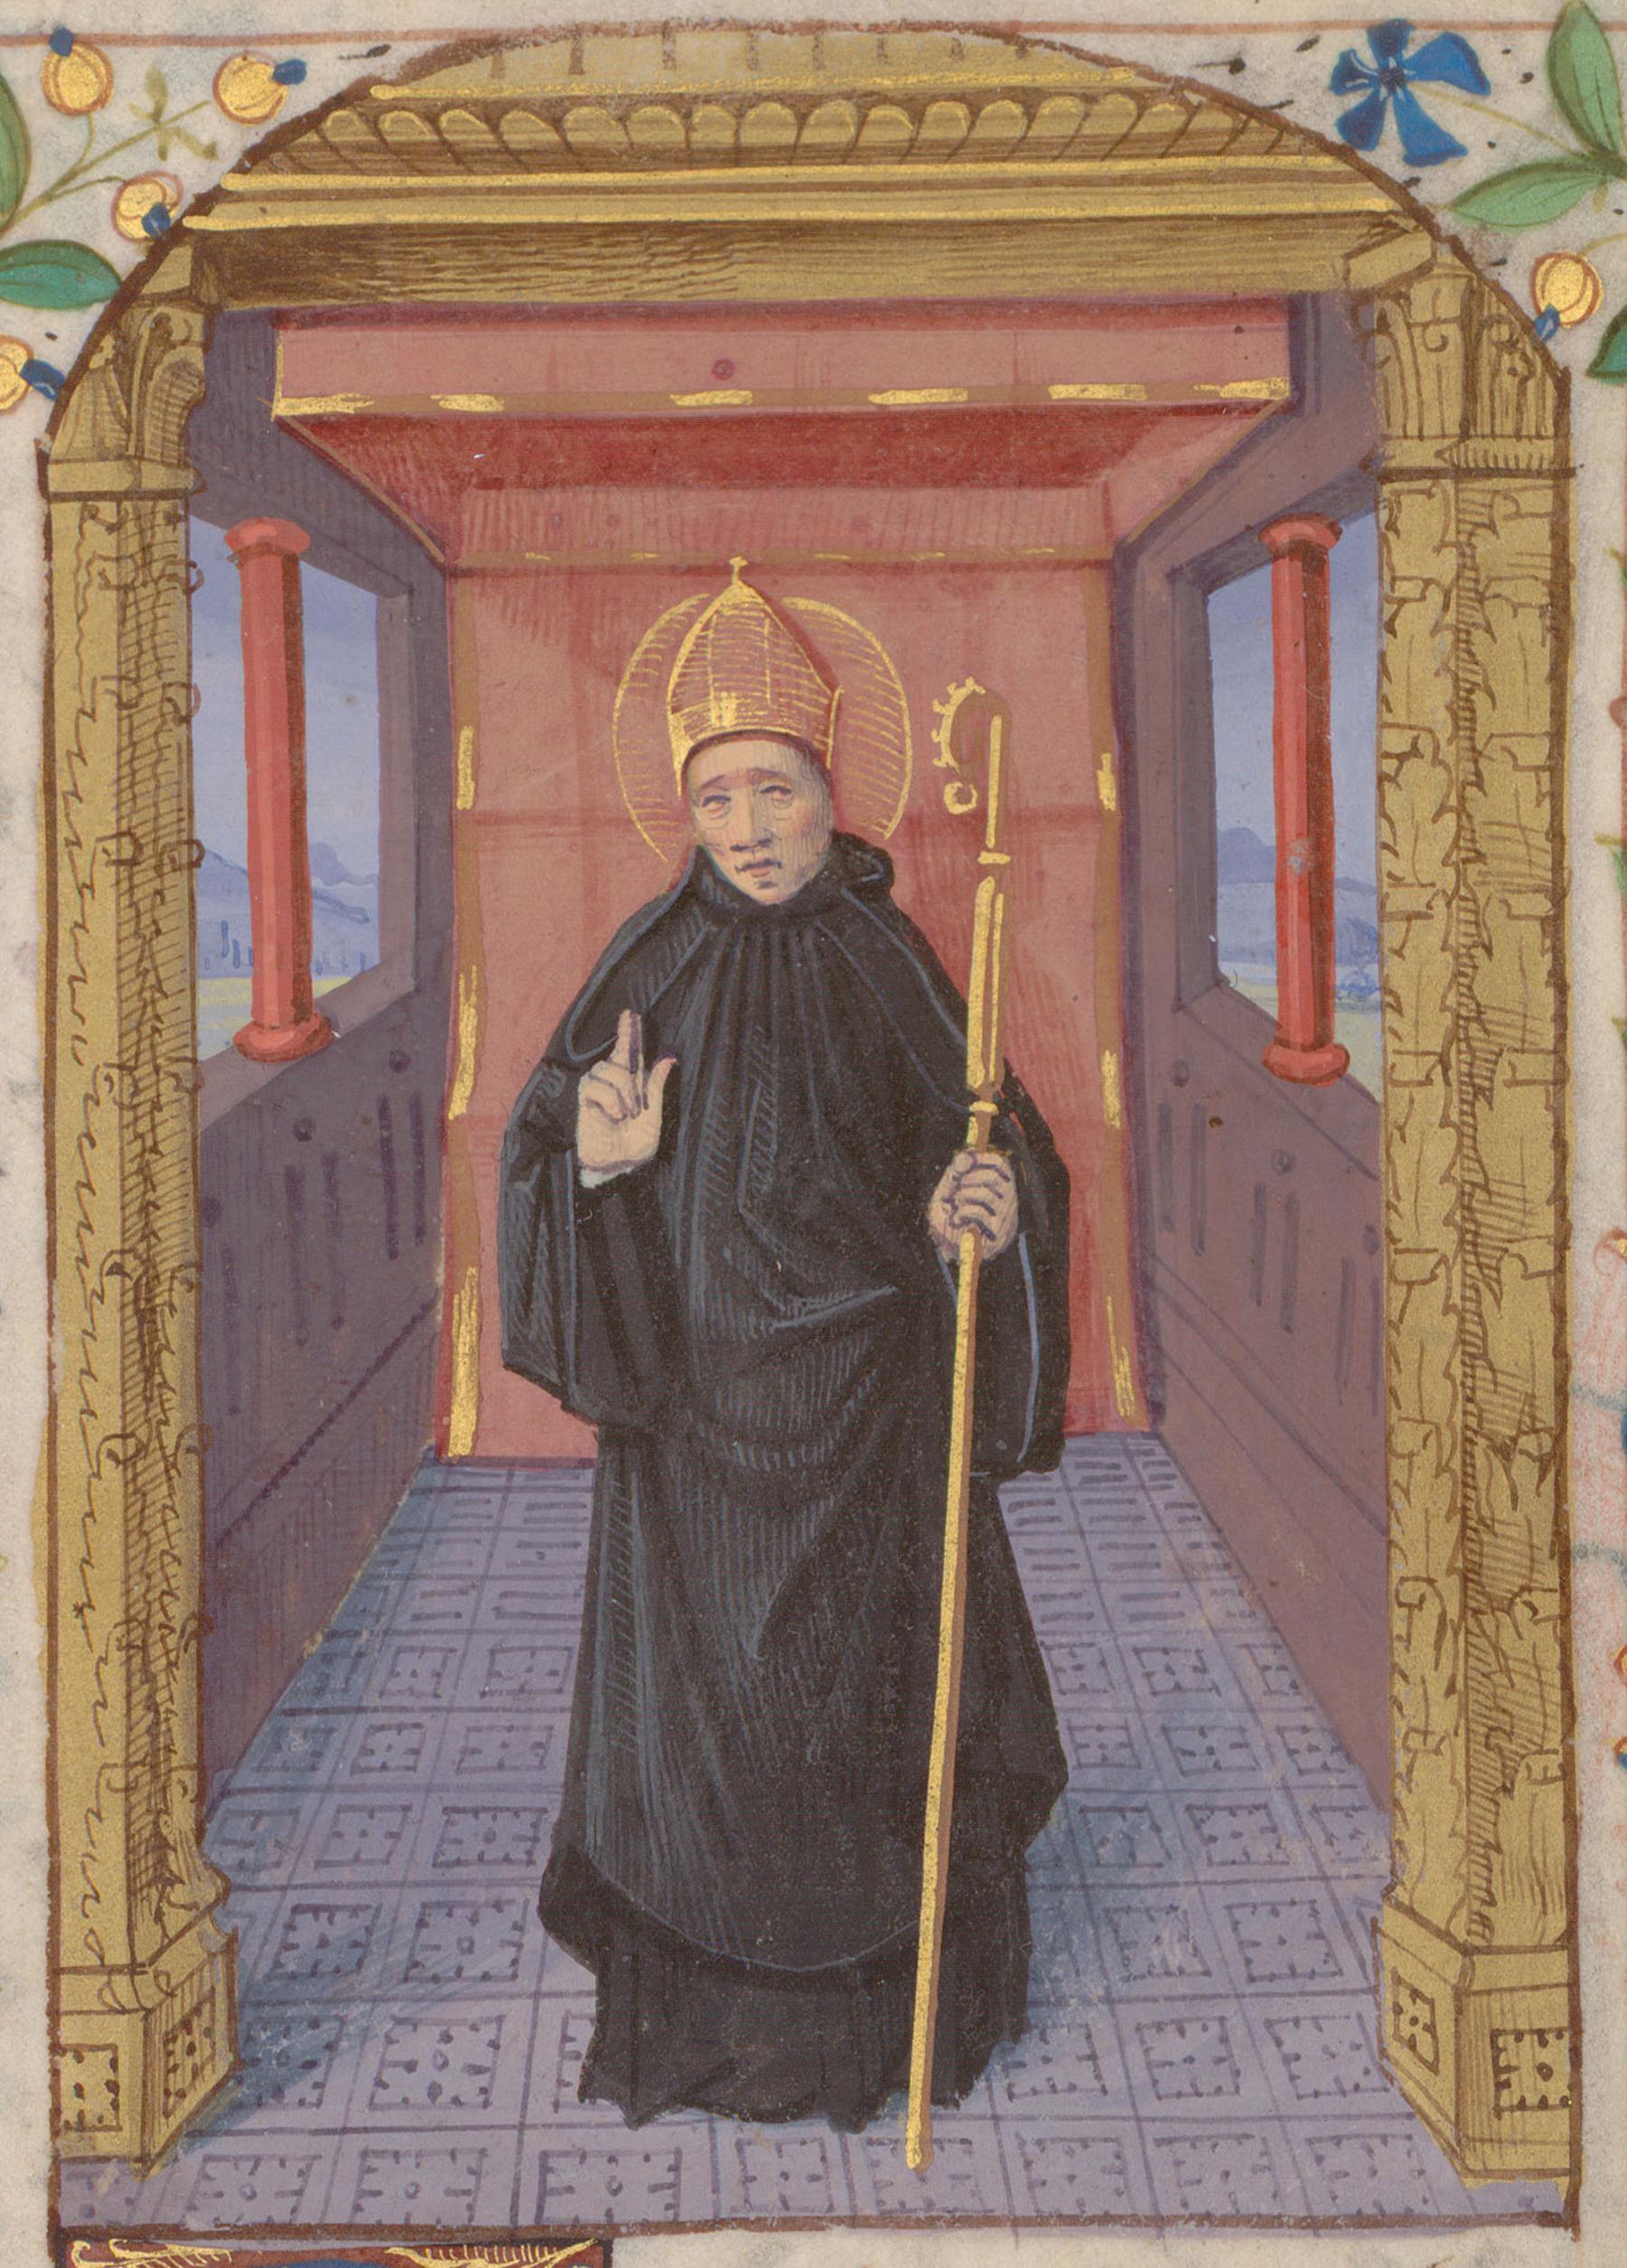 Contenu du Saint Maur